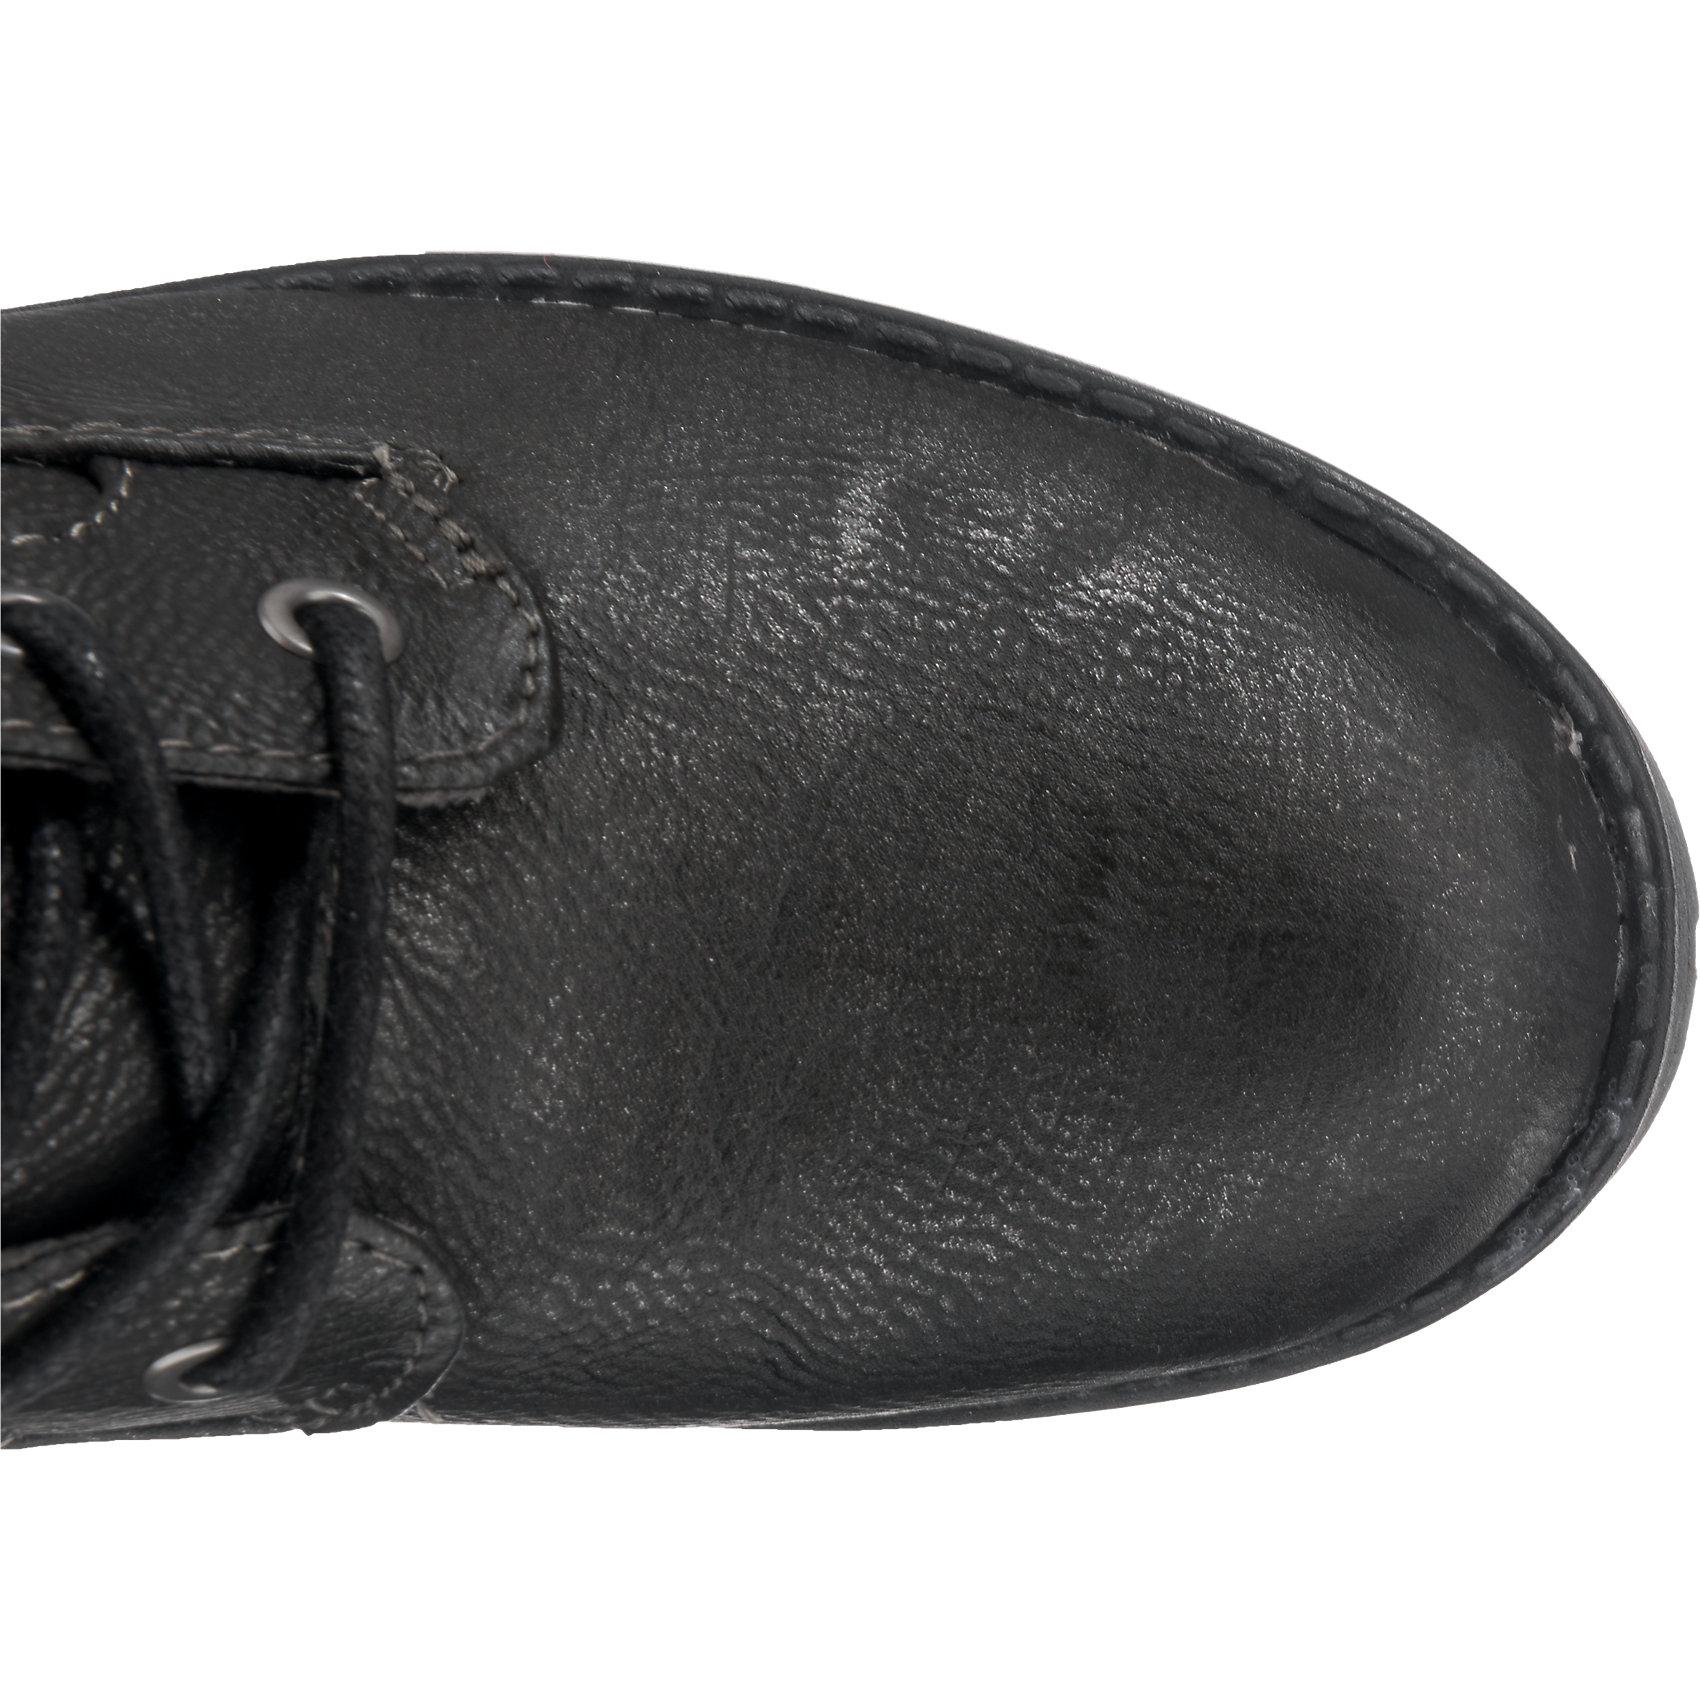 sports shoes 1cf16 f06c0 ... NEW Nike Hyperdunk - White White White Basketball Shoes (Men s 17)  ea4975 ...